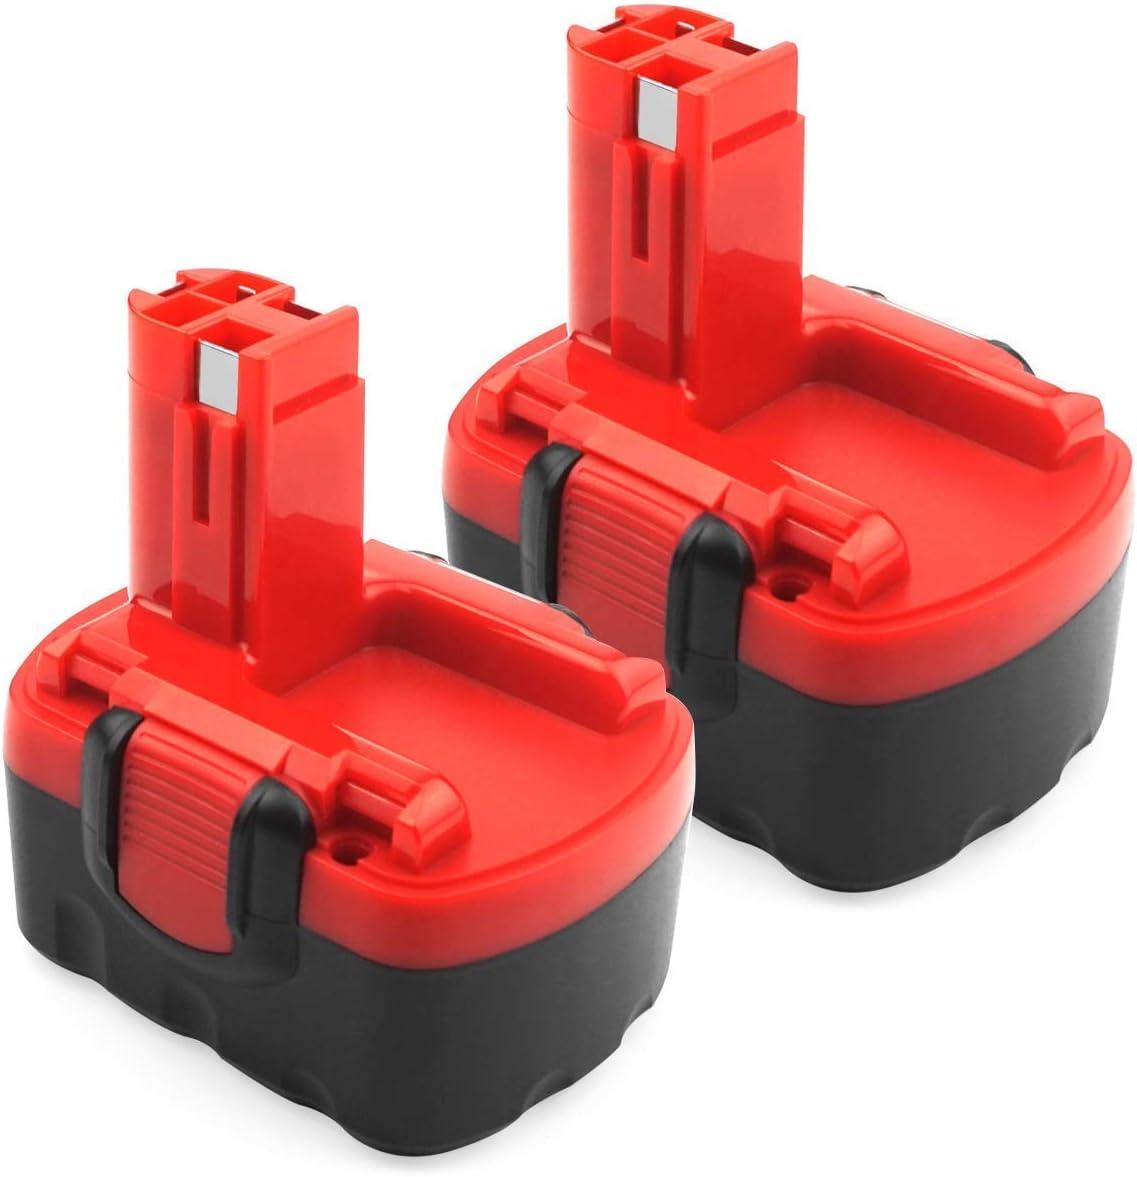 2 X ADVNOVO 14.4V 3.5Ah Ni-MH Batería para Bosch BAT038 BAT040 BAT041 BAT140 BAT159 2607335275 2607335276 2607335533 2607335534 2607335465 2607335678 2607335685 2607335711